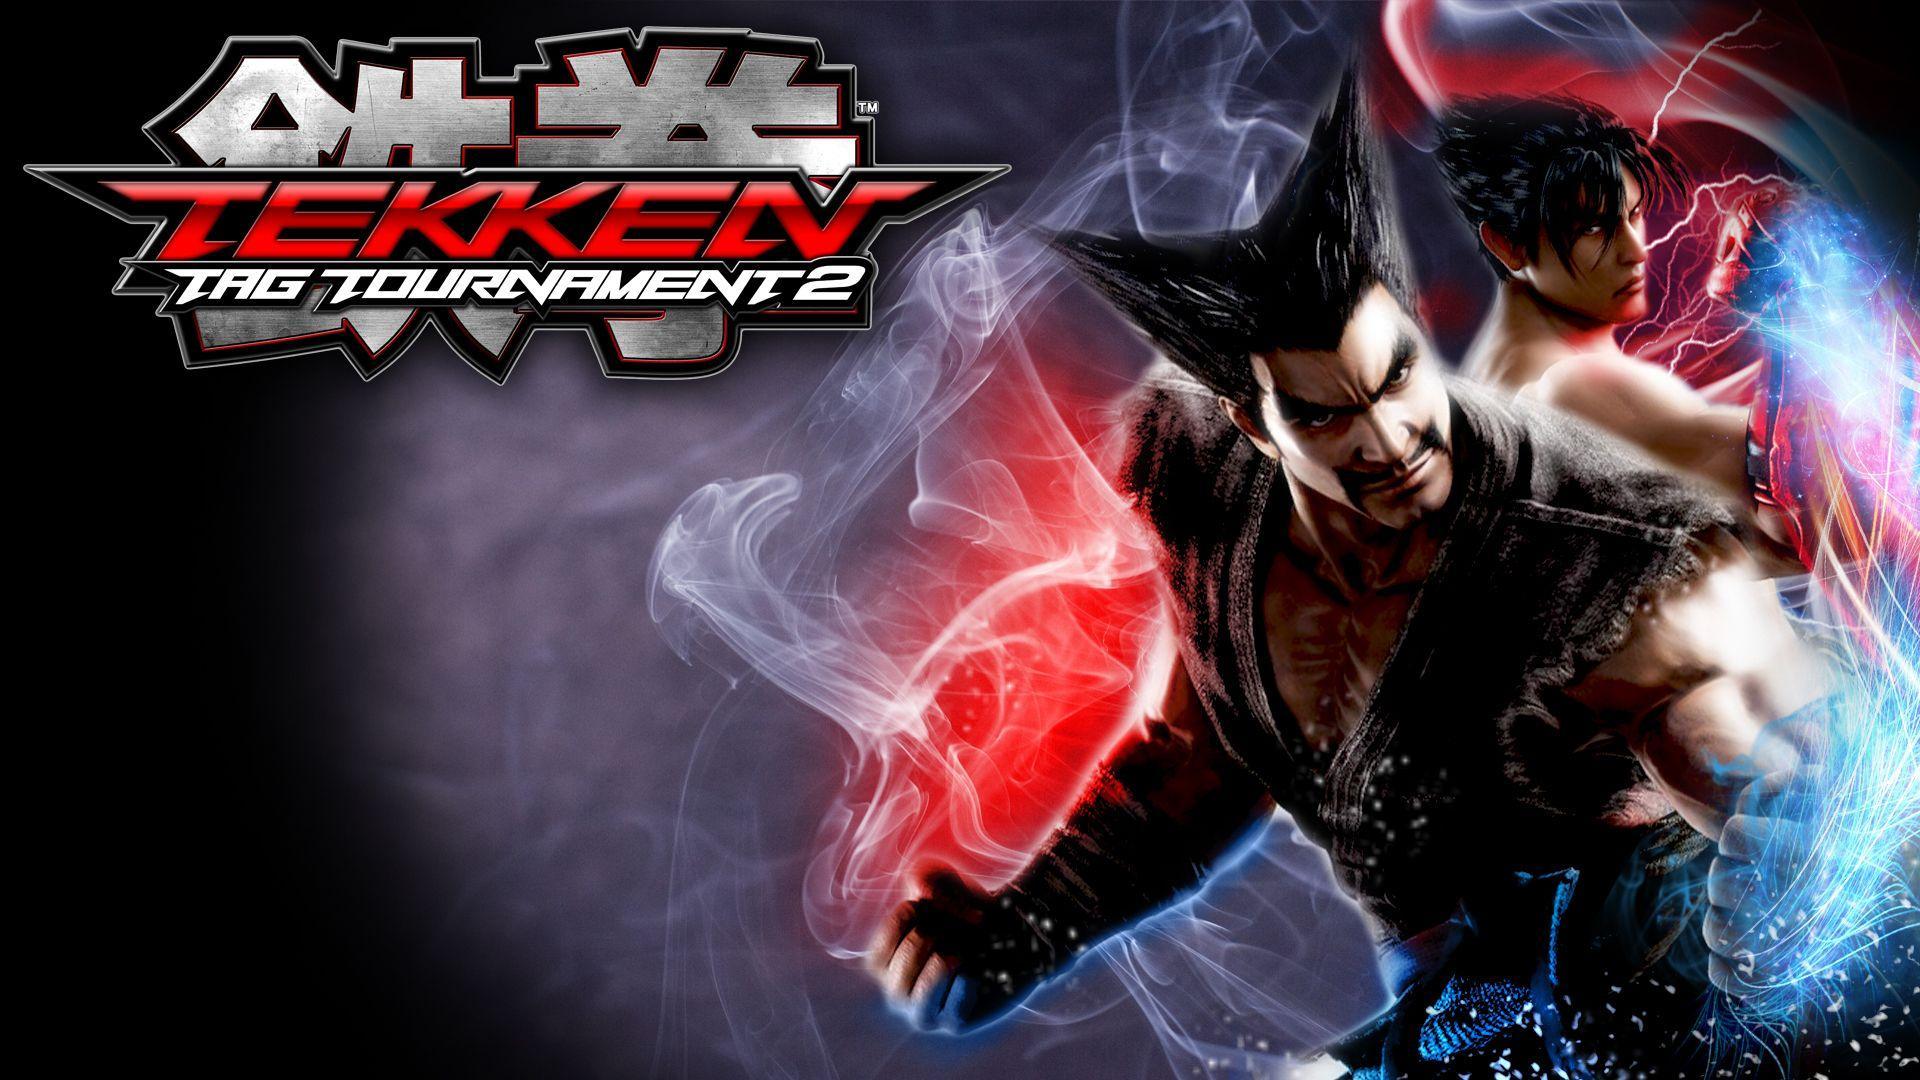 Tekken Tag Tournament 2 Wallpapers Top Free Tekken Tag